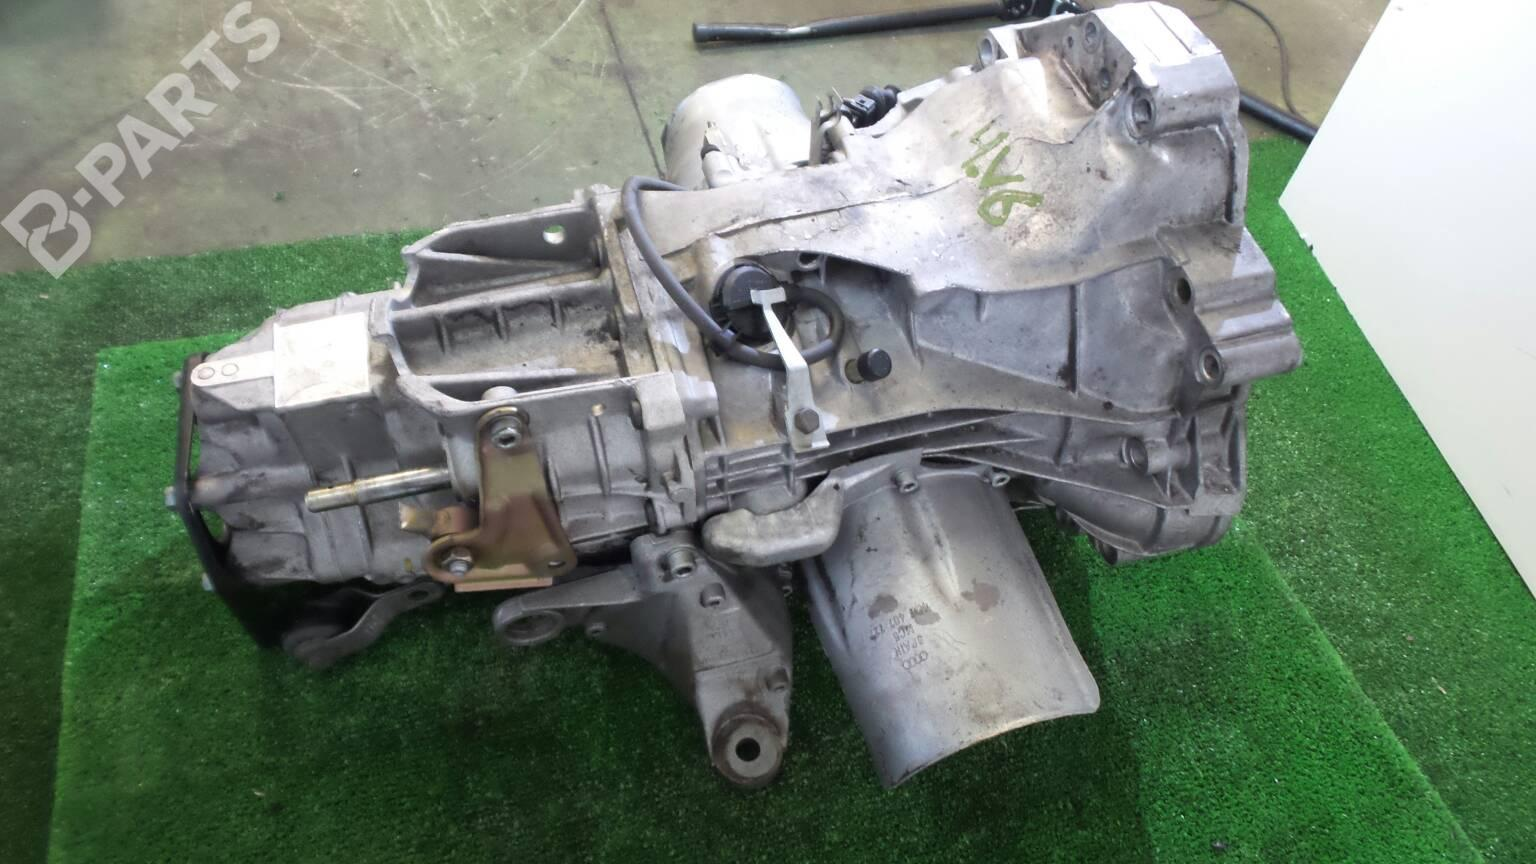 ... Manual Gearbox CXY AUDI, A4 (8D2, B5) 2.6(4 doors) ...